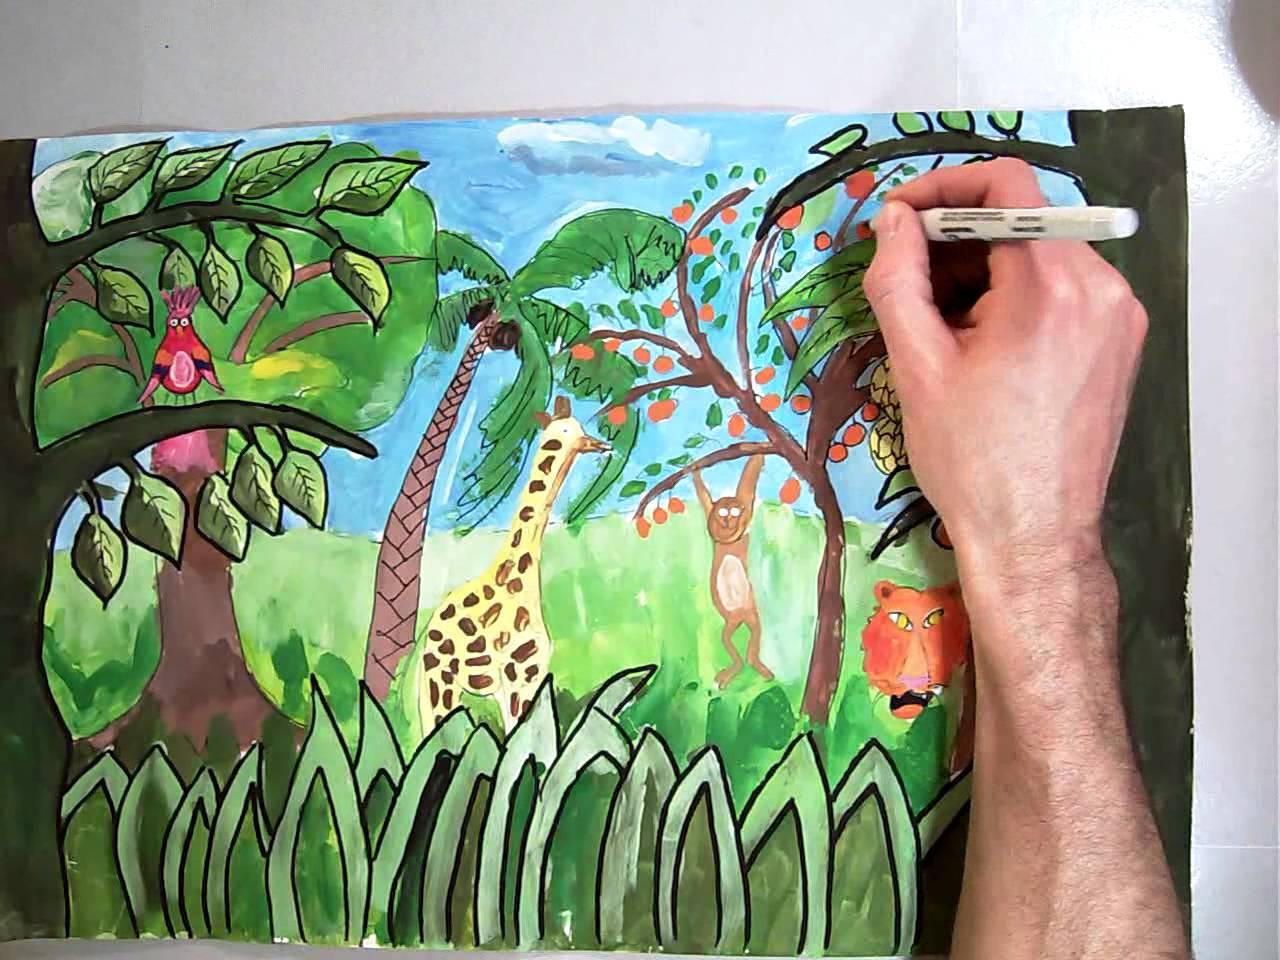 Drawn rainforest rousseau Rousseau Painting for YouTube Sharpie